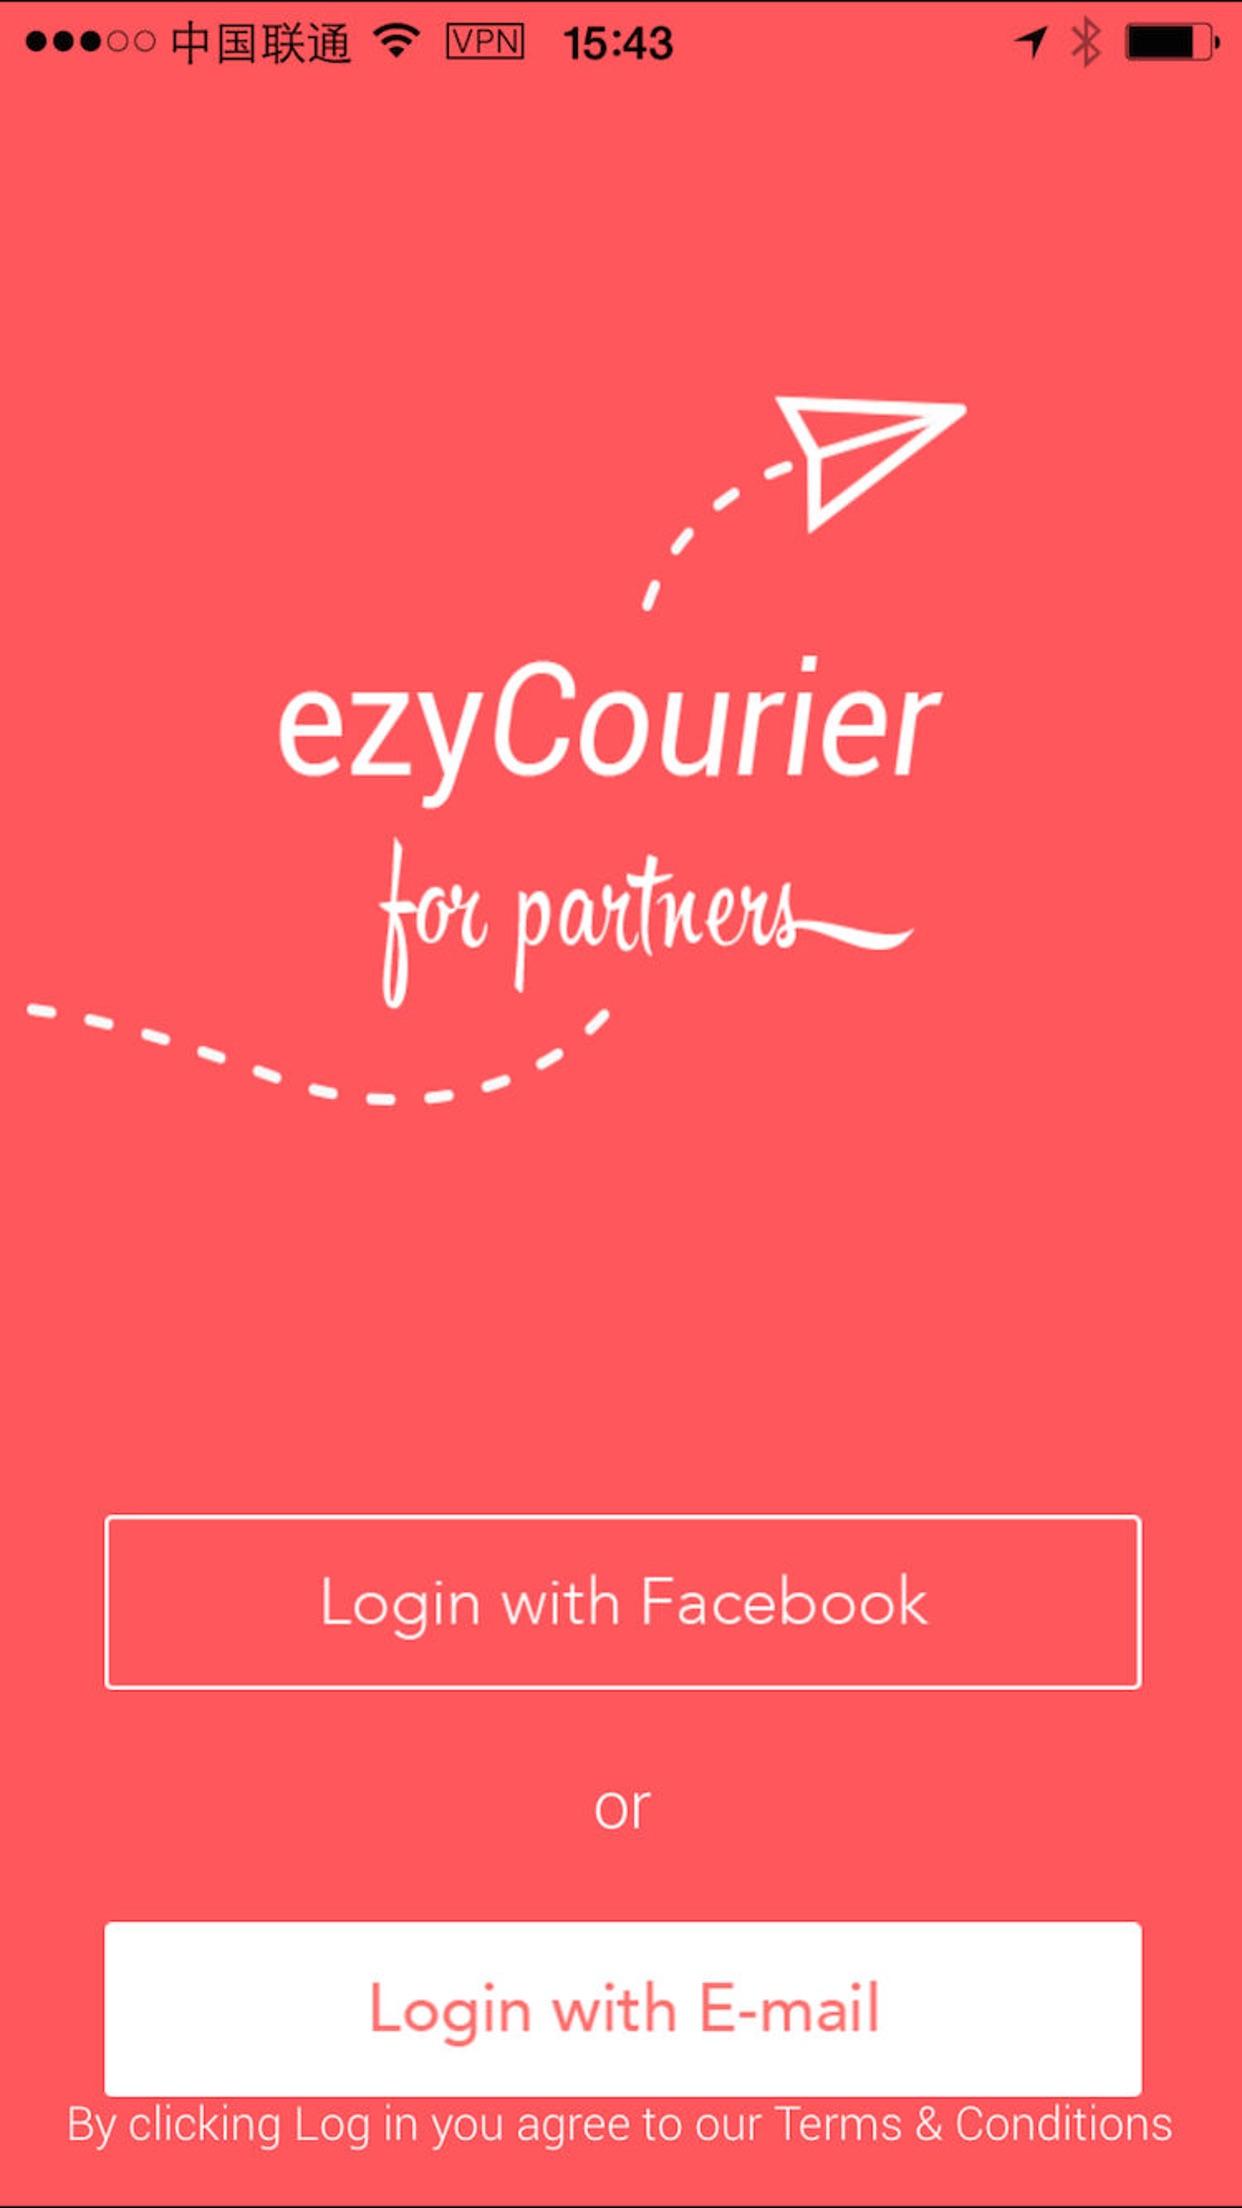 ezyCourier Partner Screenshot